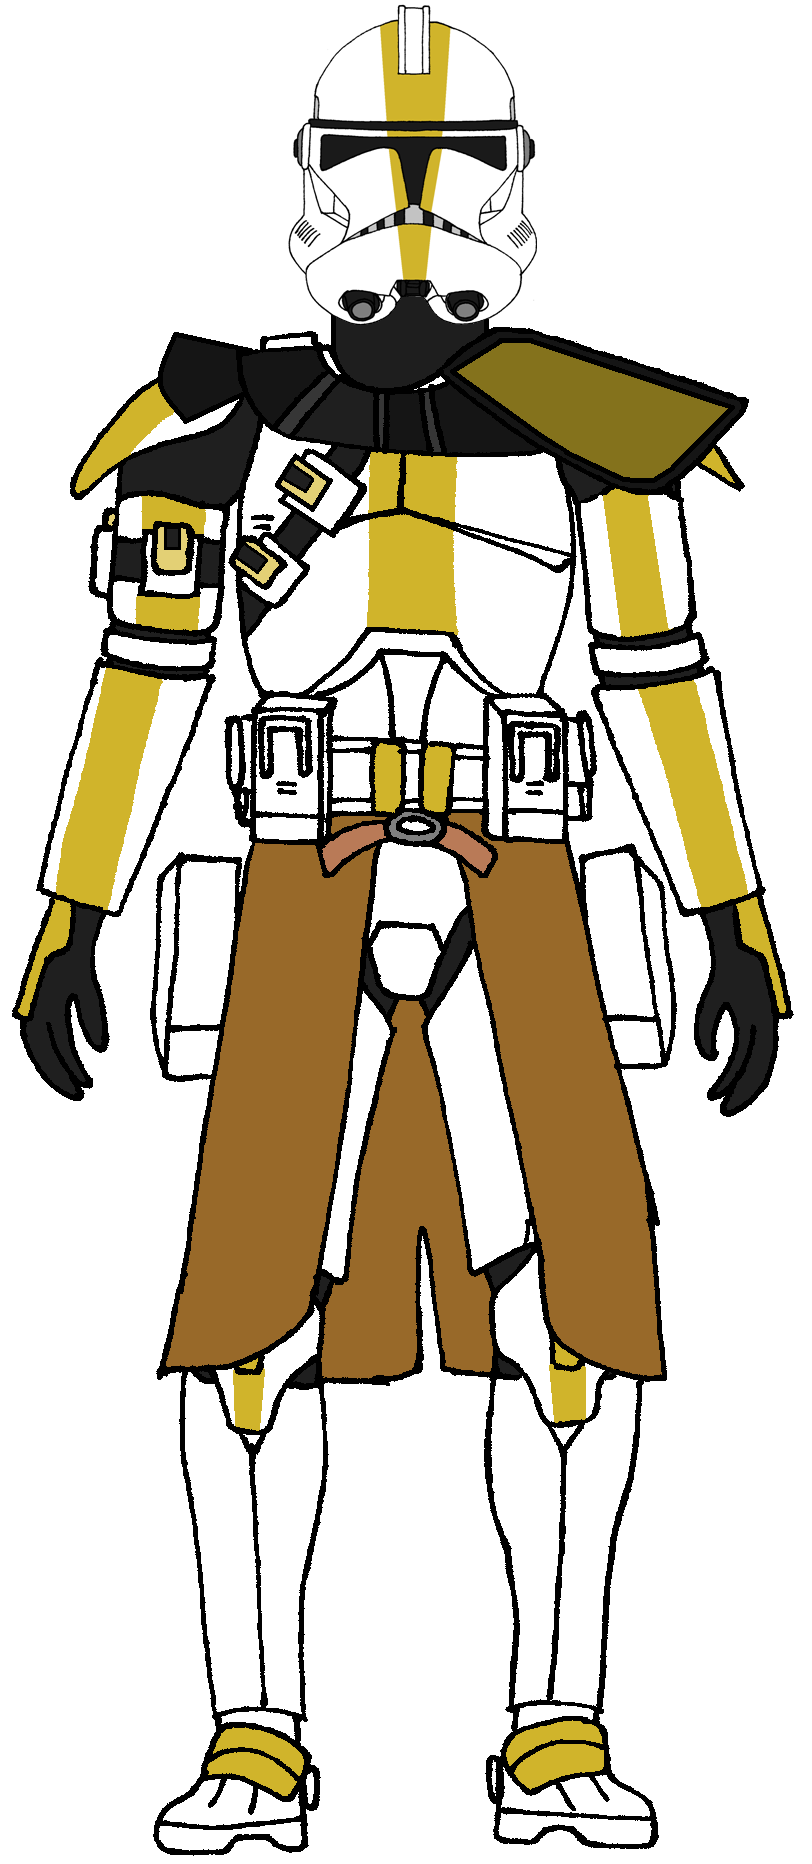 clone trooper 327th star corps 2 clone units and clone types